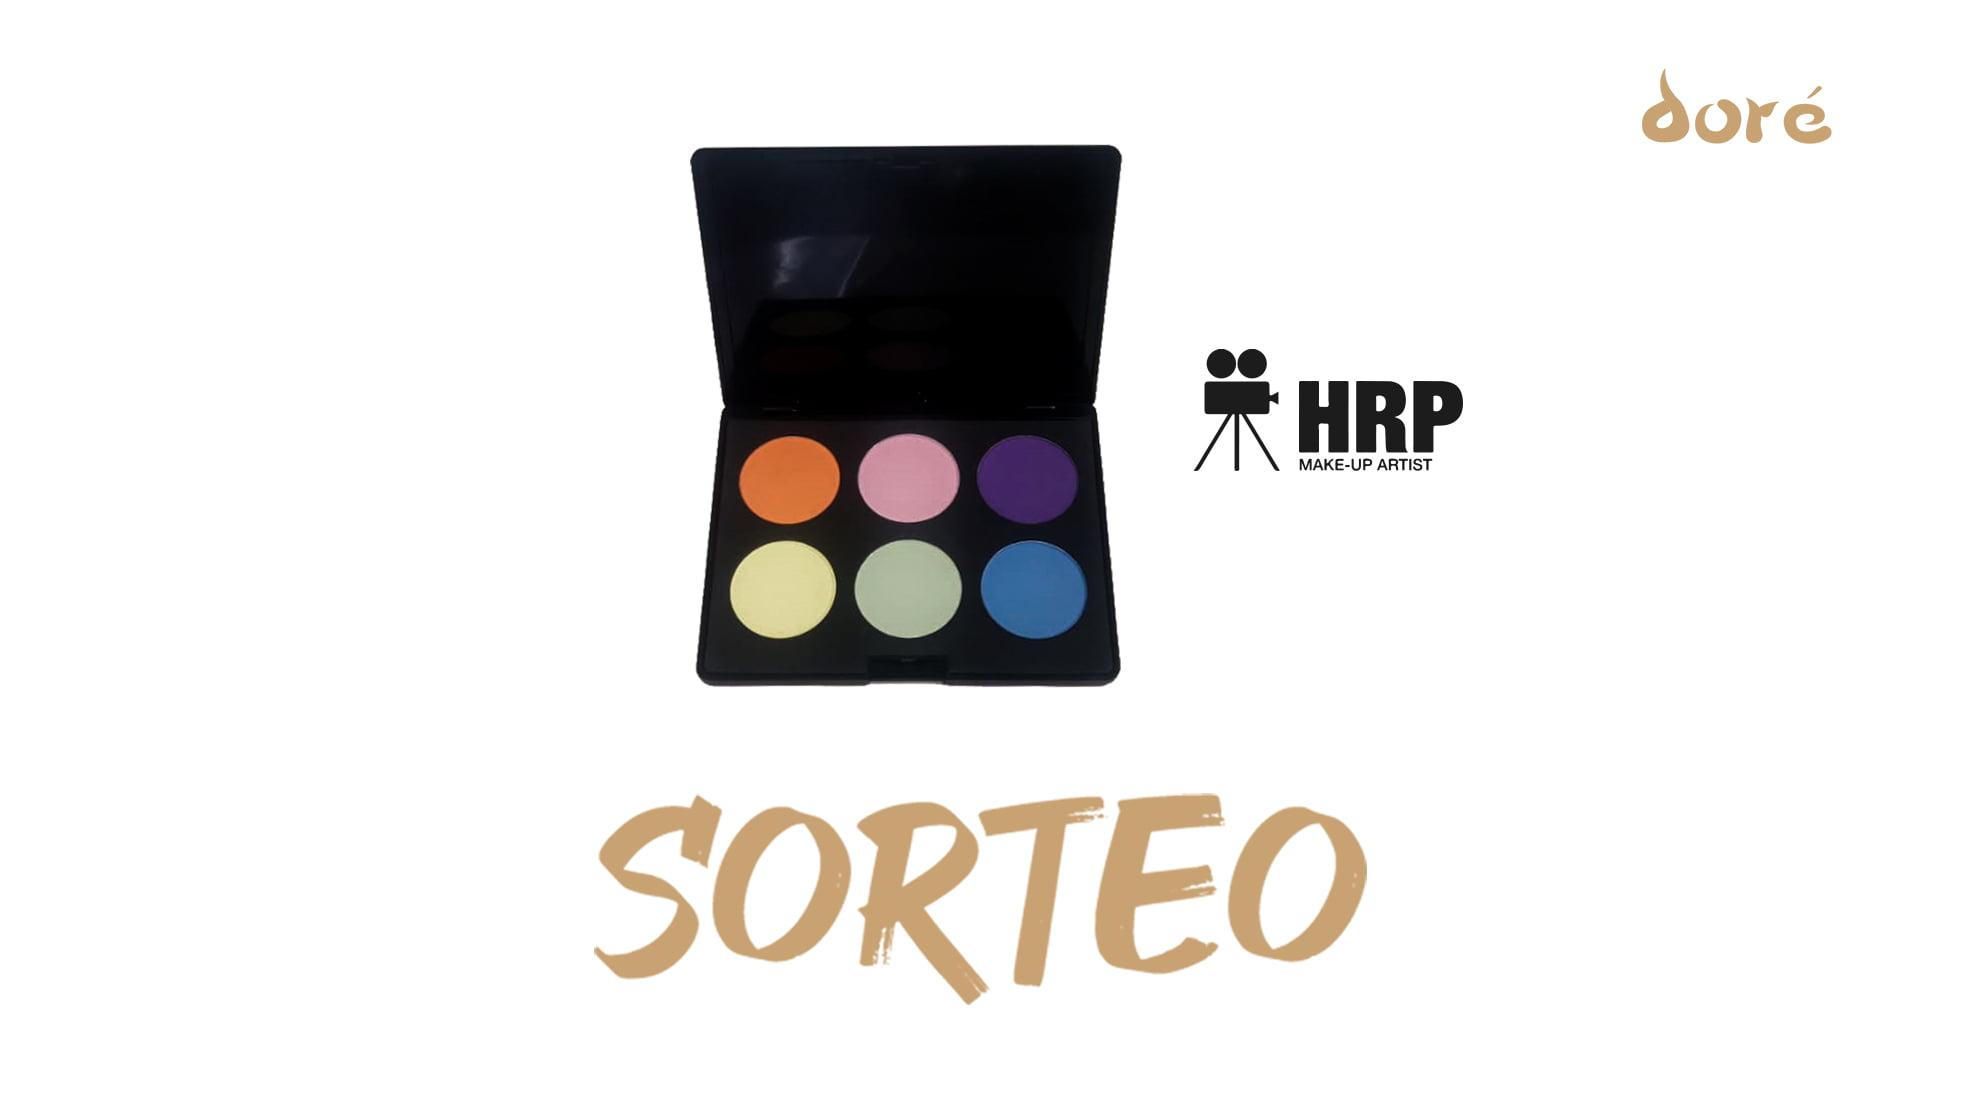 Harpo Dore Giveaway